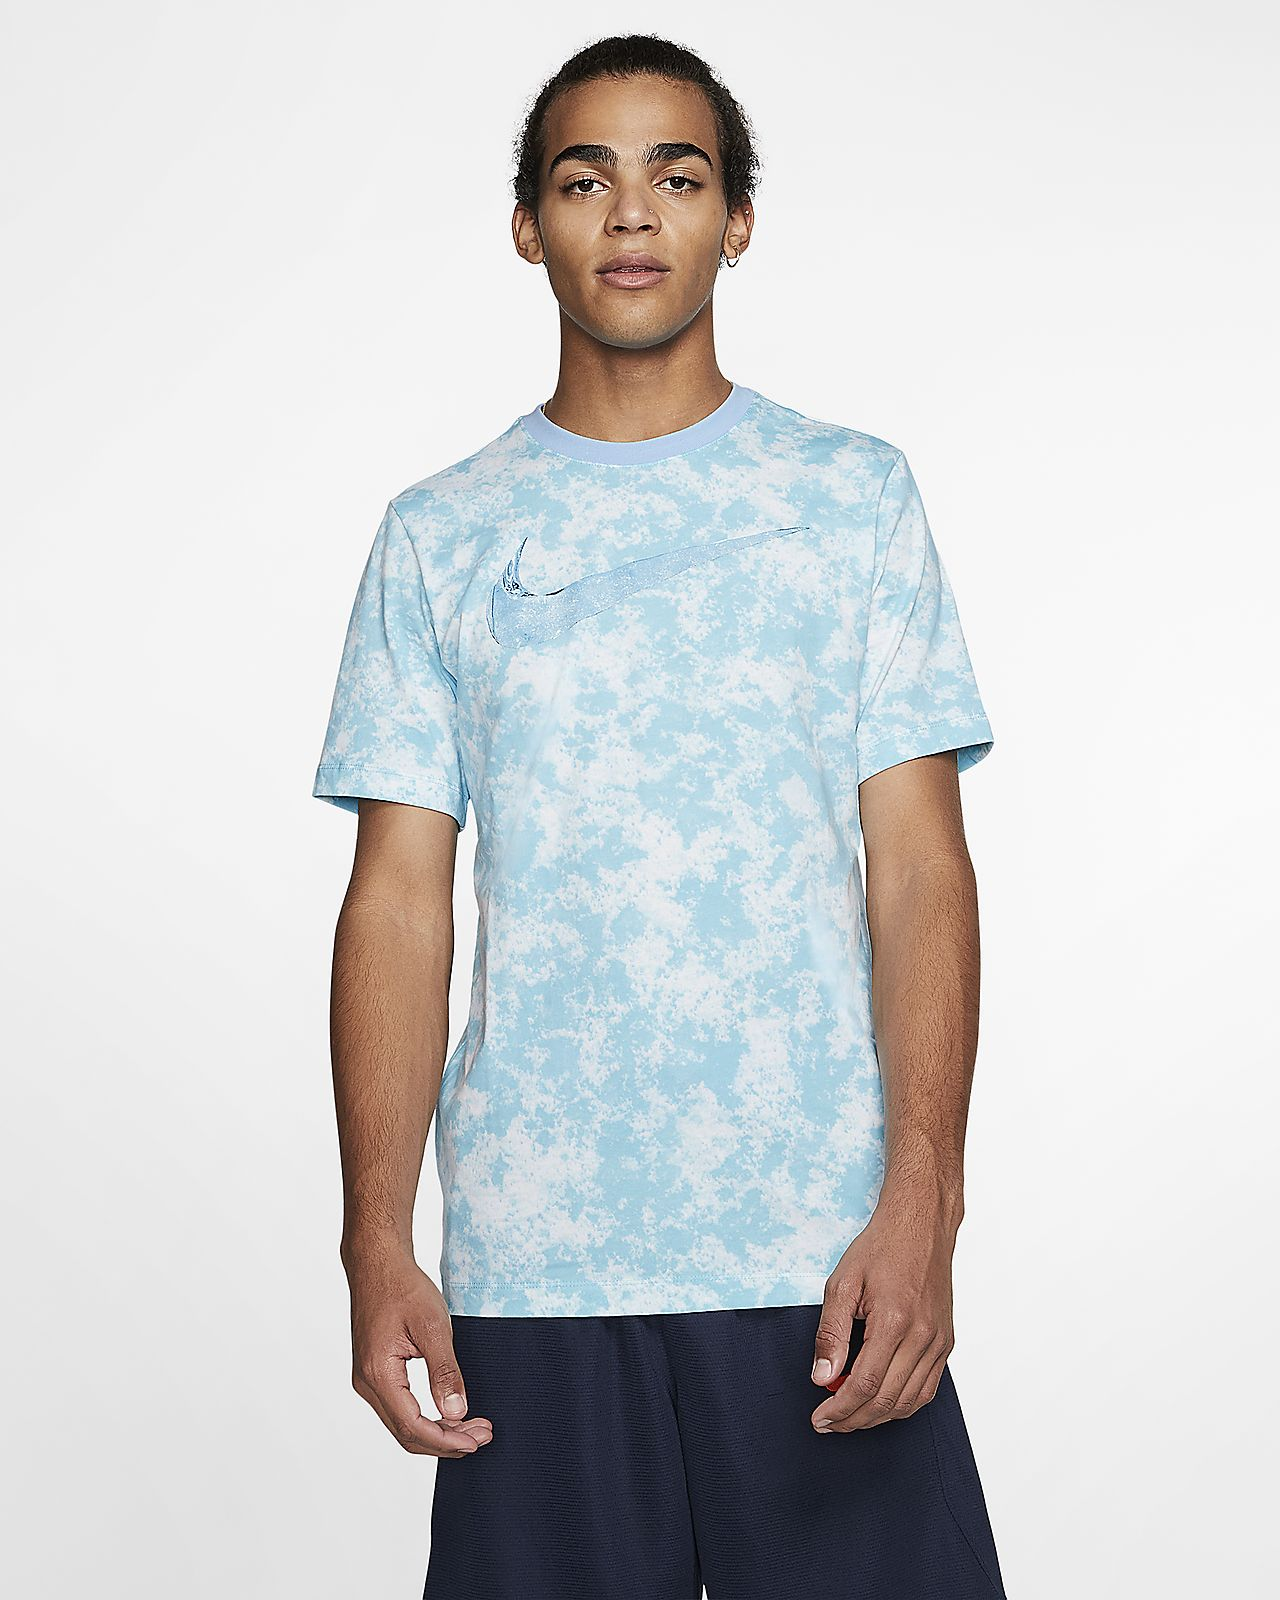 Nike Dri-FIT Basketbalshirt met print voor heren